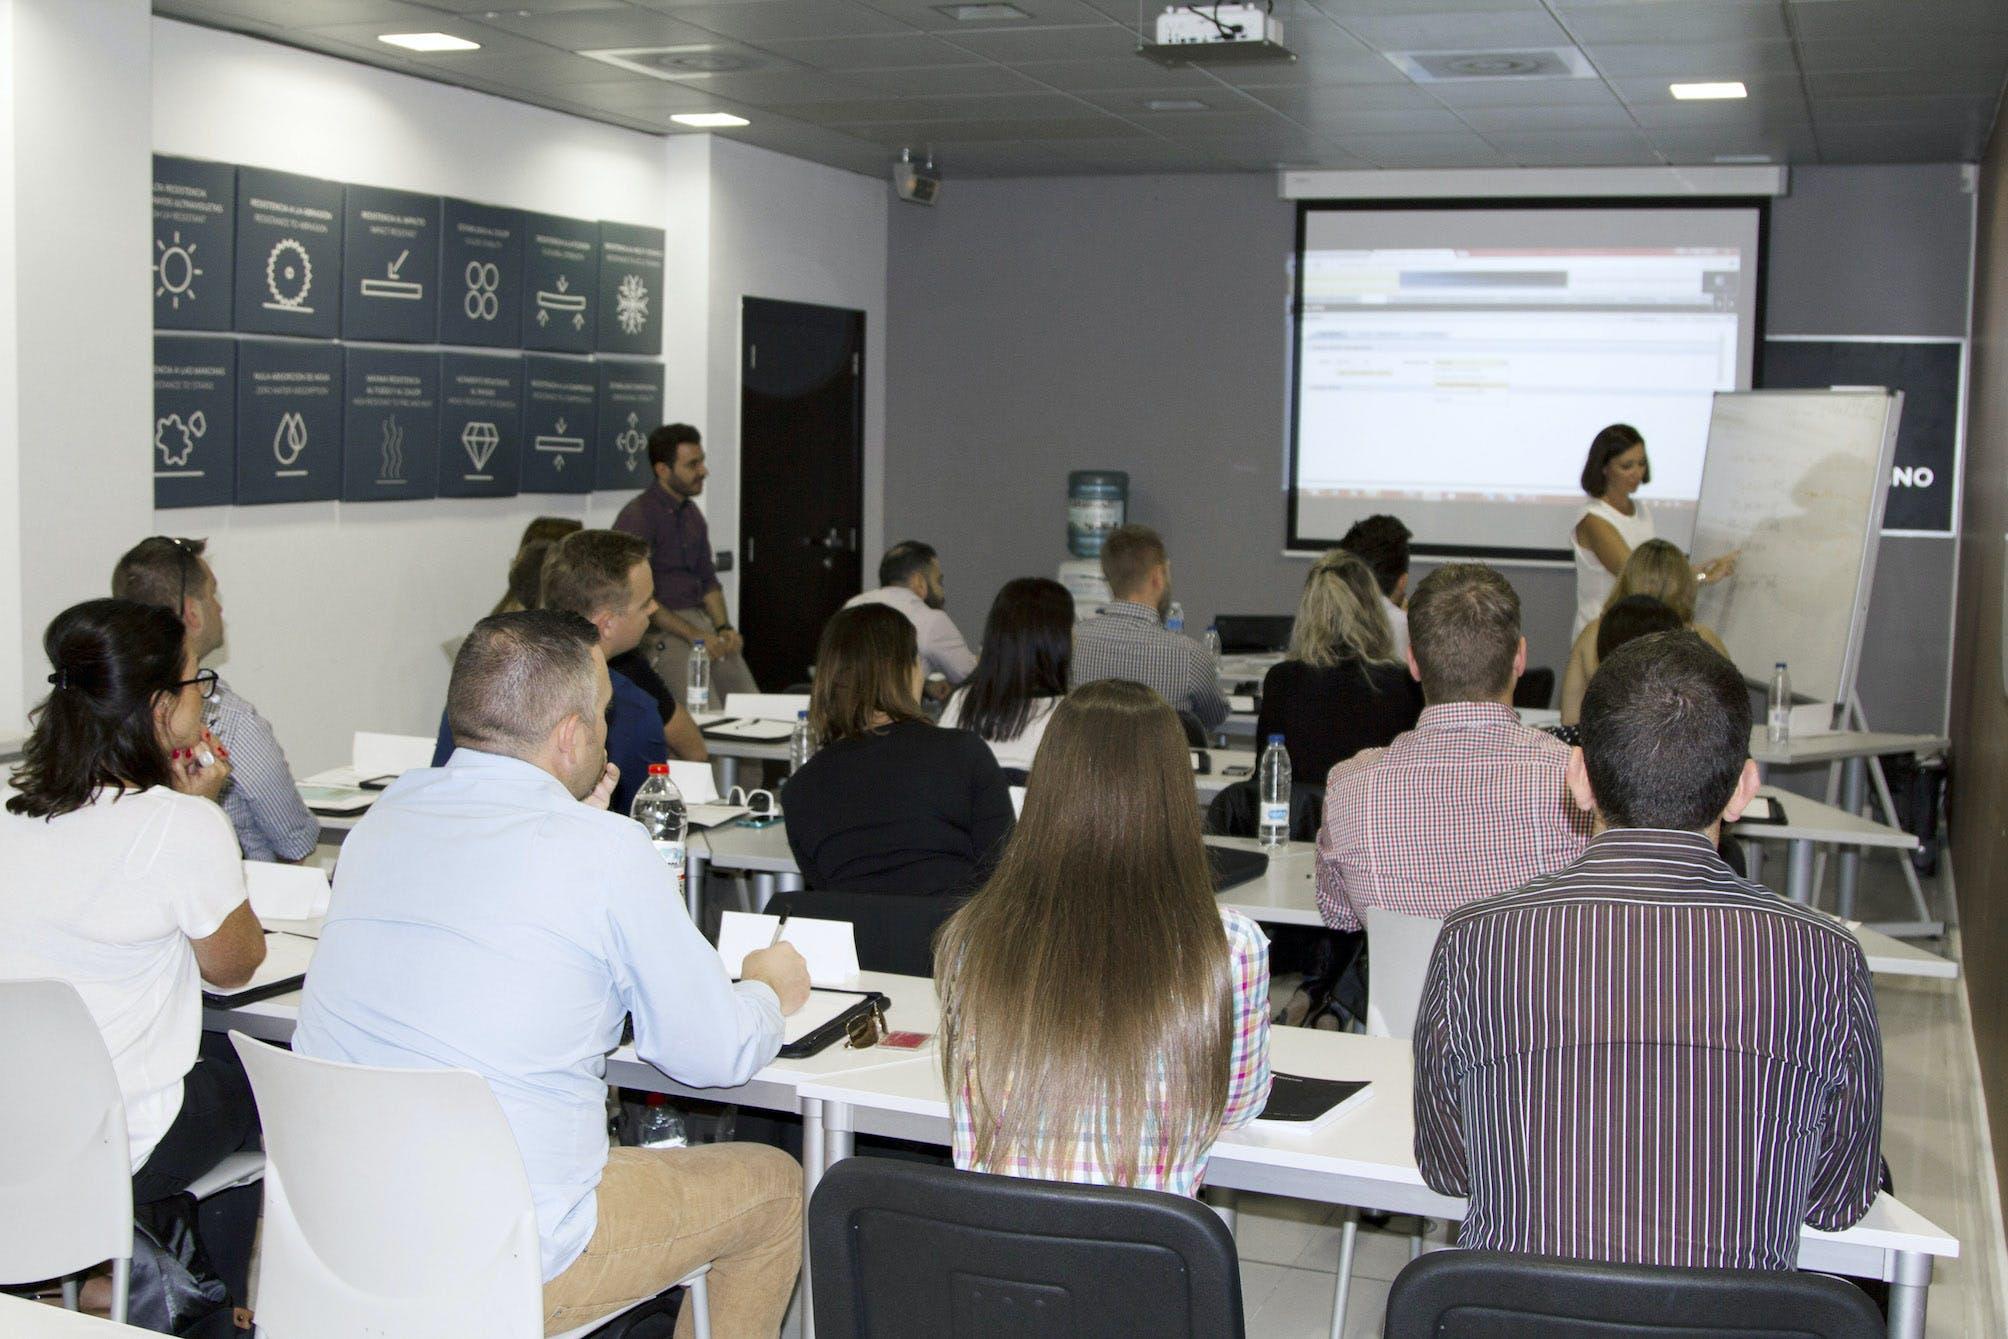 Image of Formacion Cosentino 1 in Cosentino places its faith in innovation to contribute to the 2030 Agenda - Cosentino